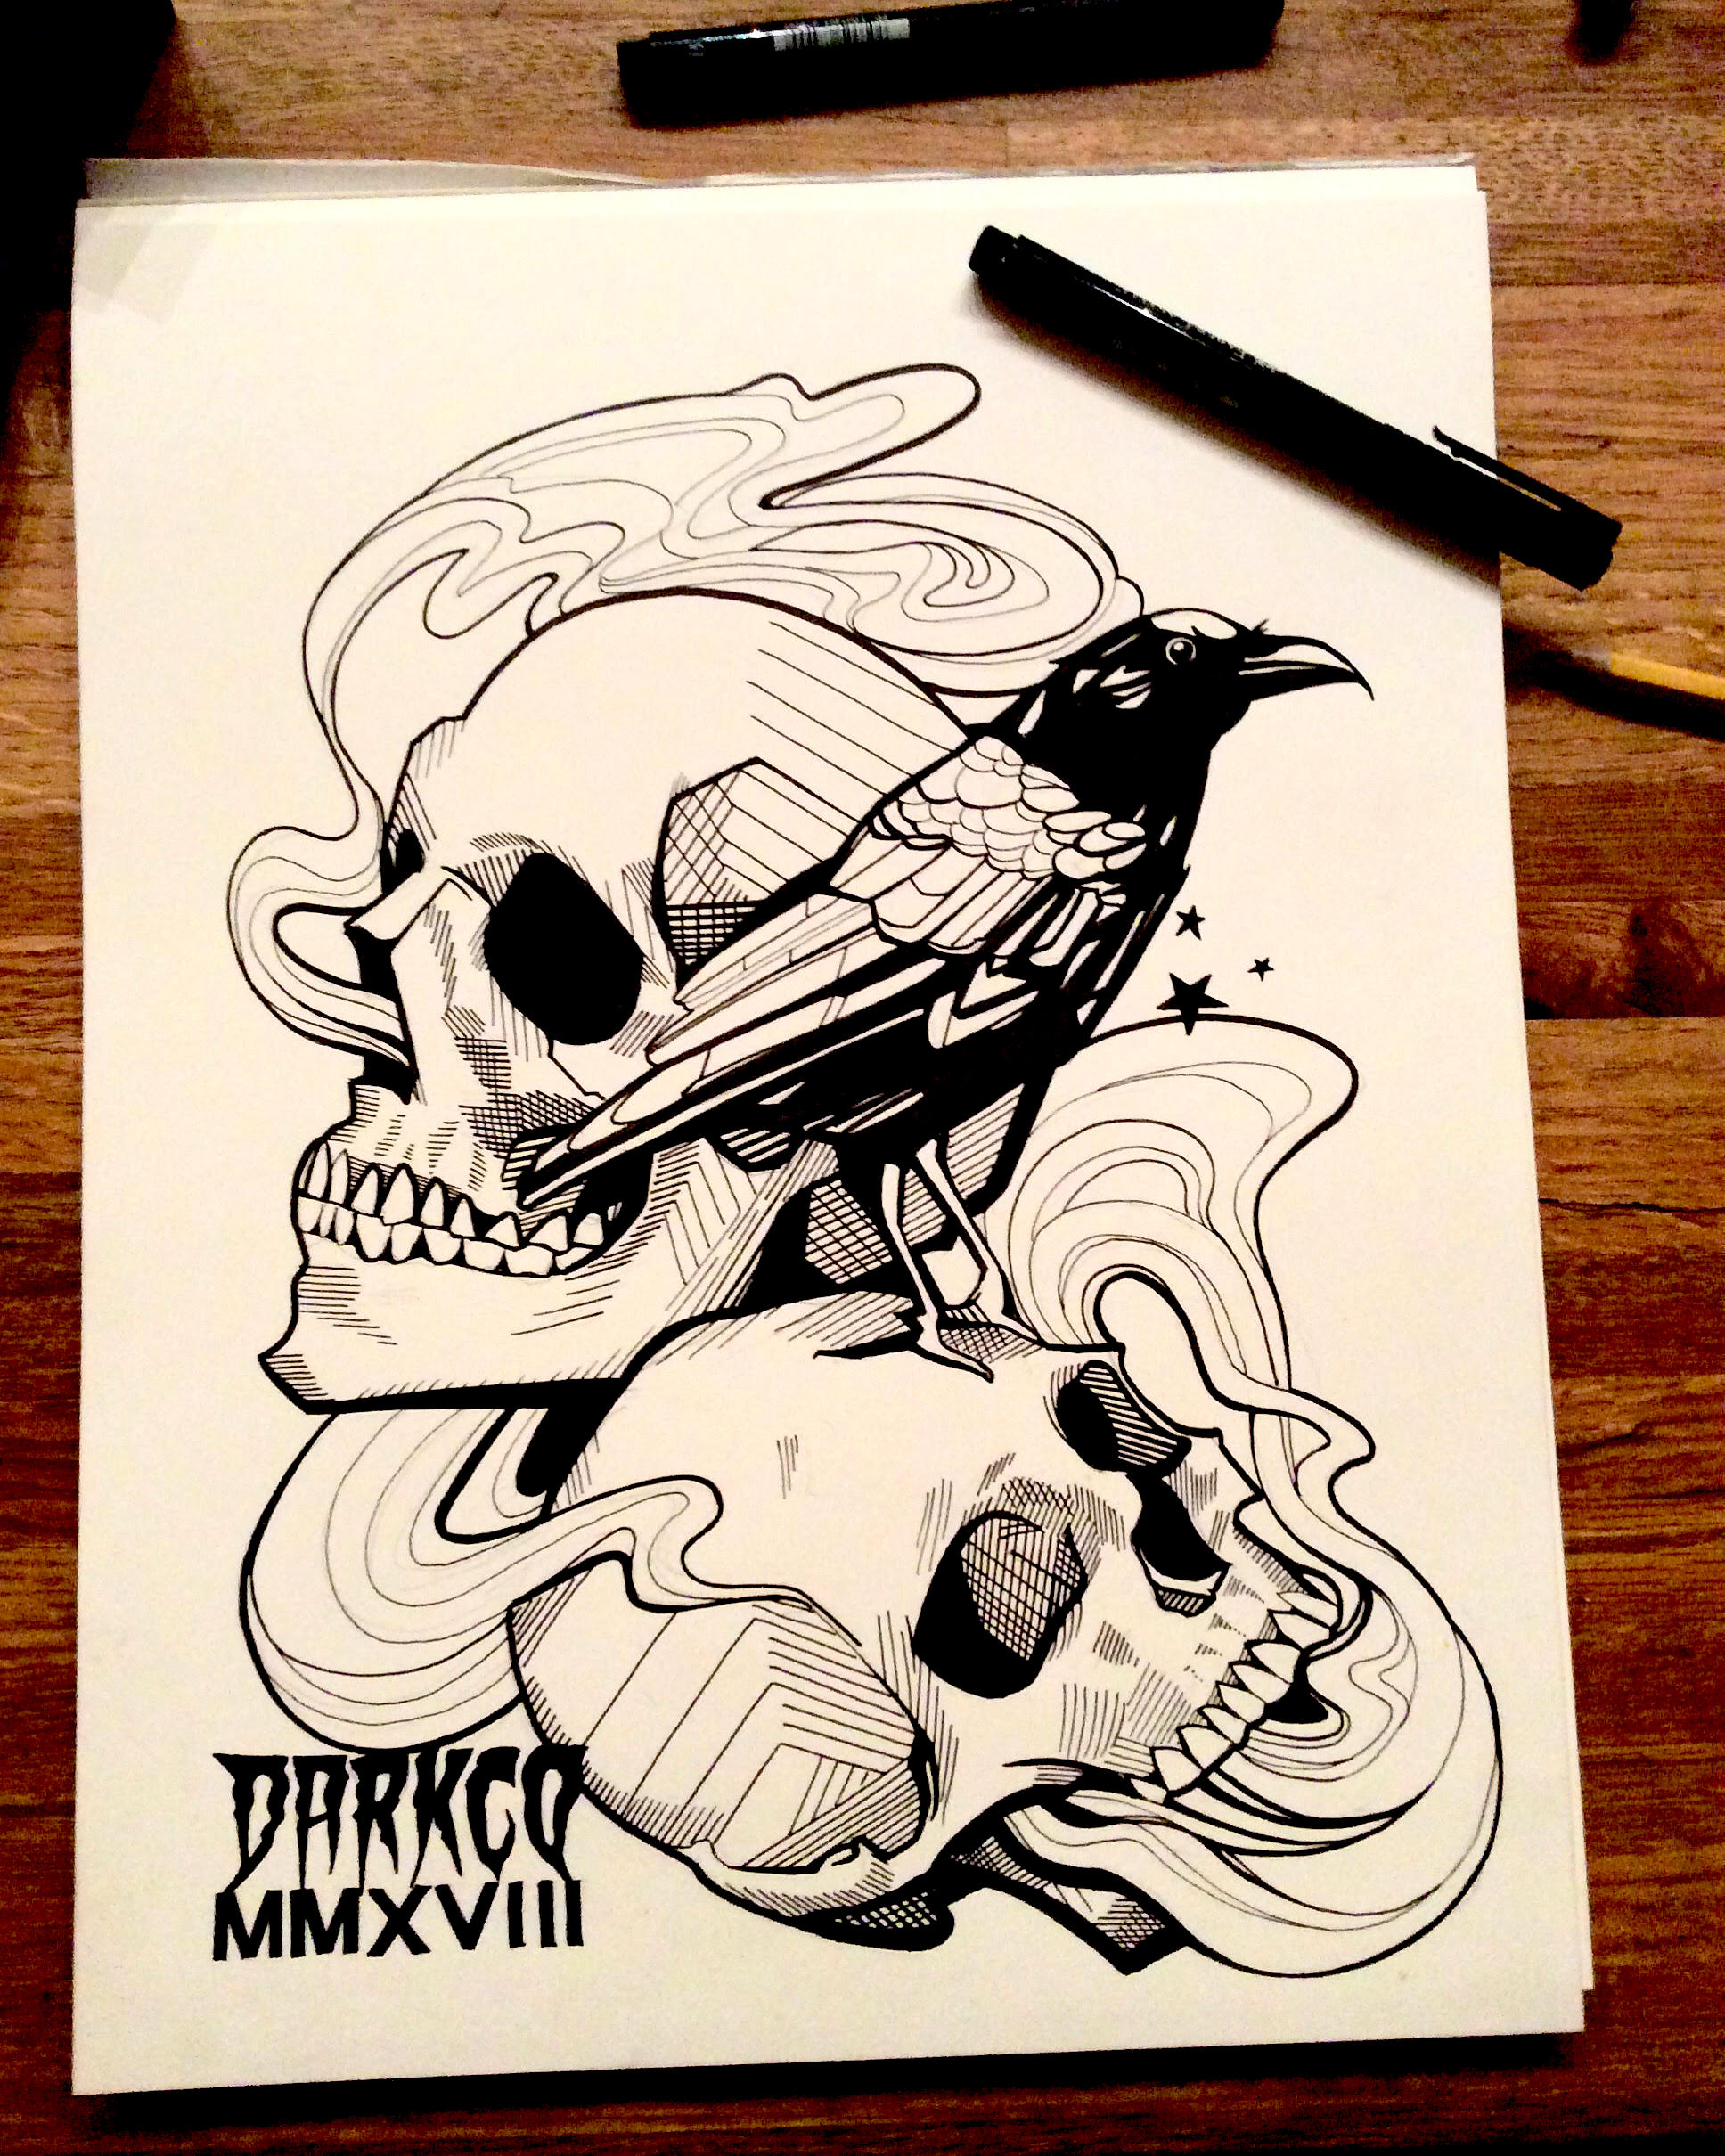 darkco bmx